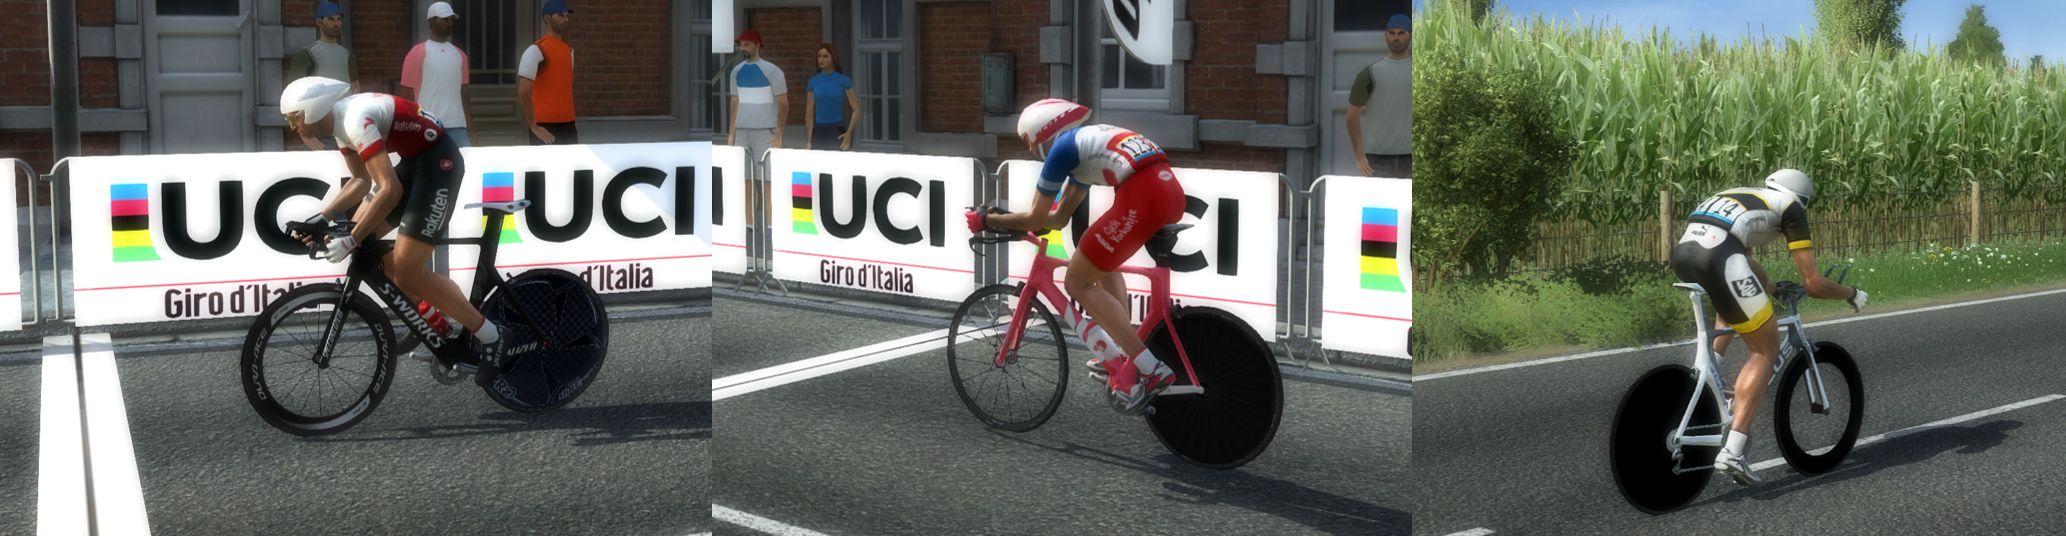 pcmdaily.com/images/mg/2020/Reports/GTM/Giro/S14/mg20_giro_s14_31.jpg